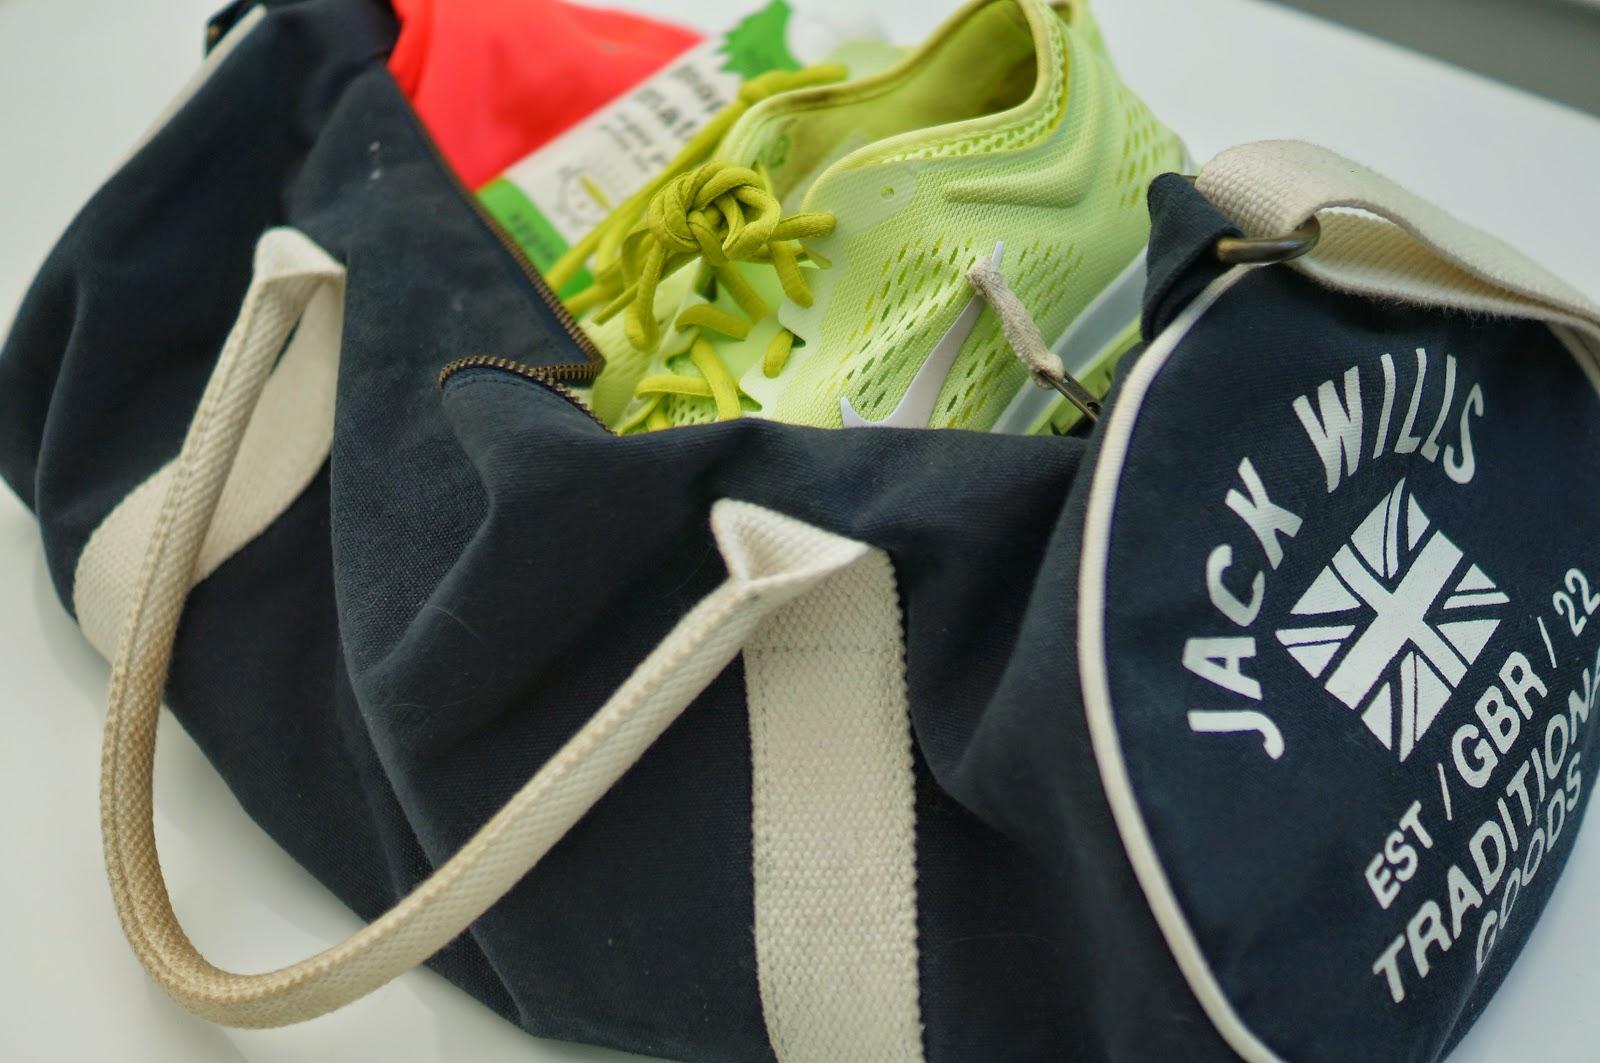 jack wills gym bag